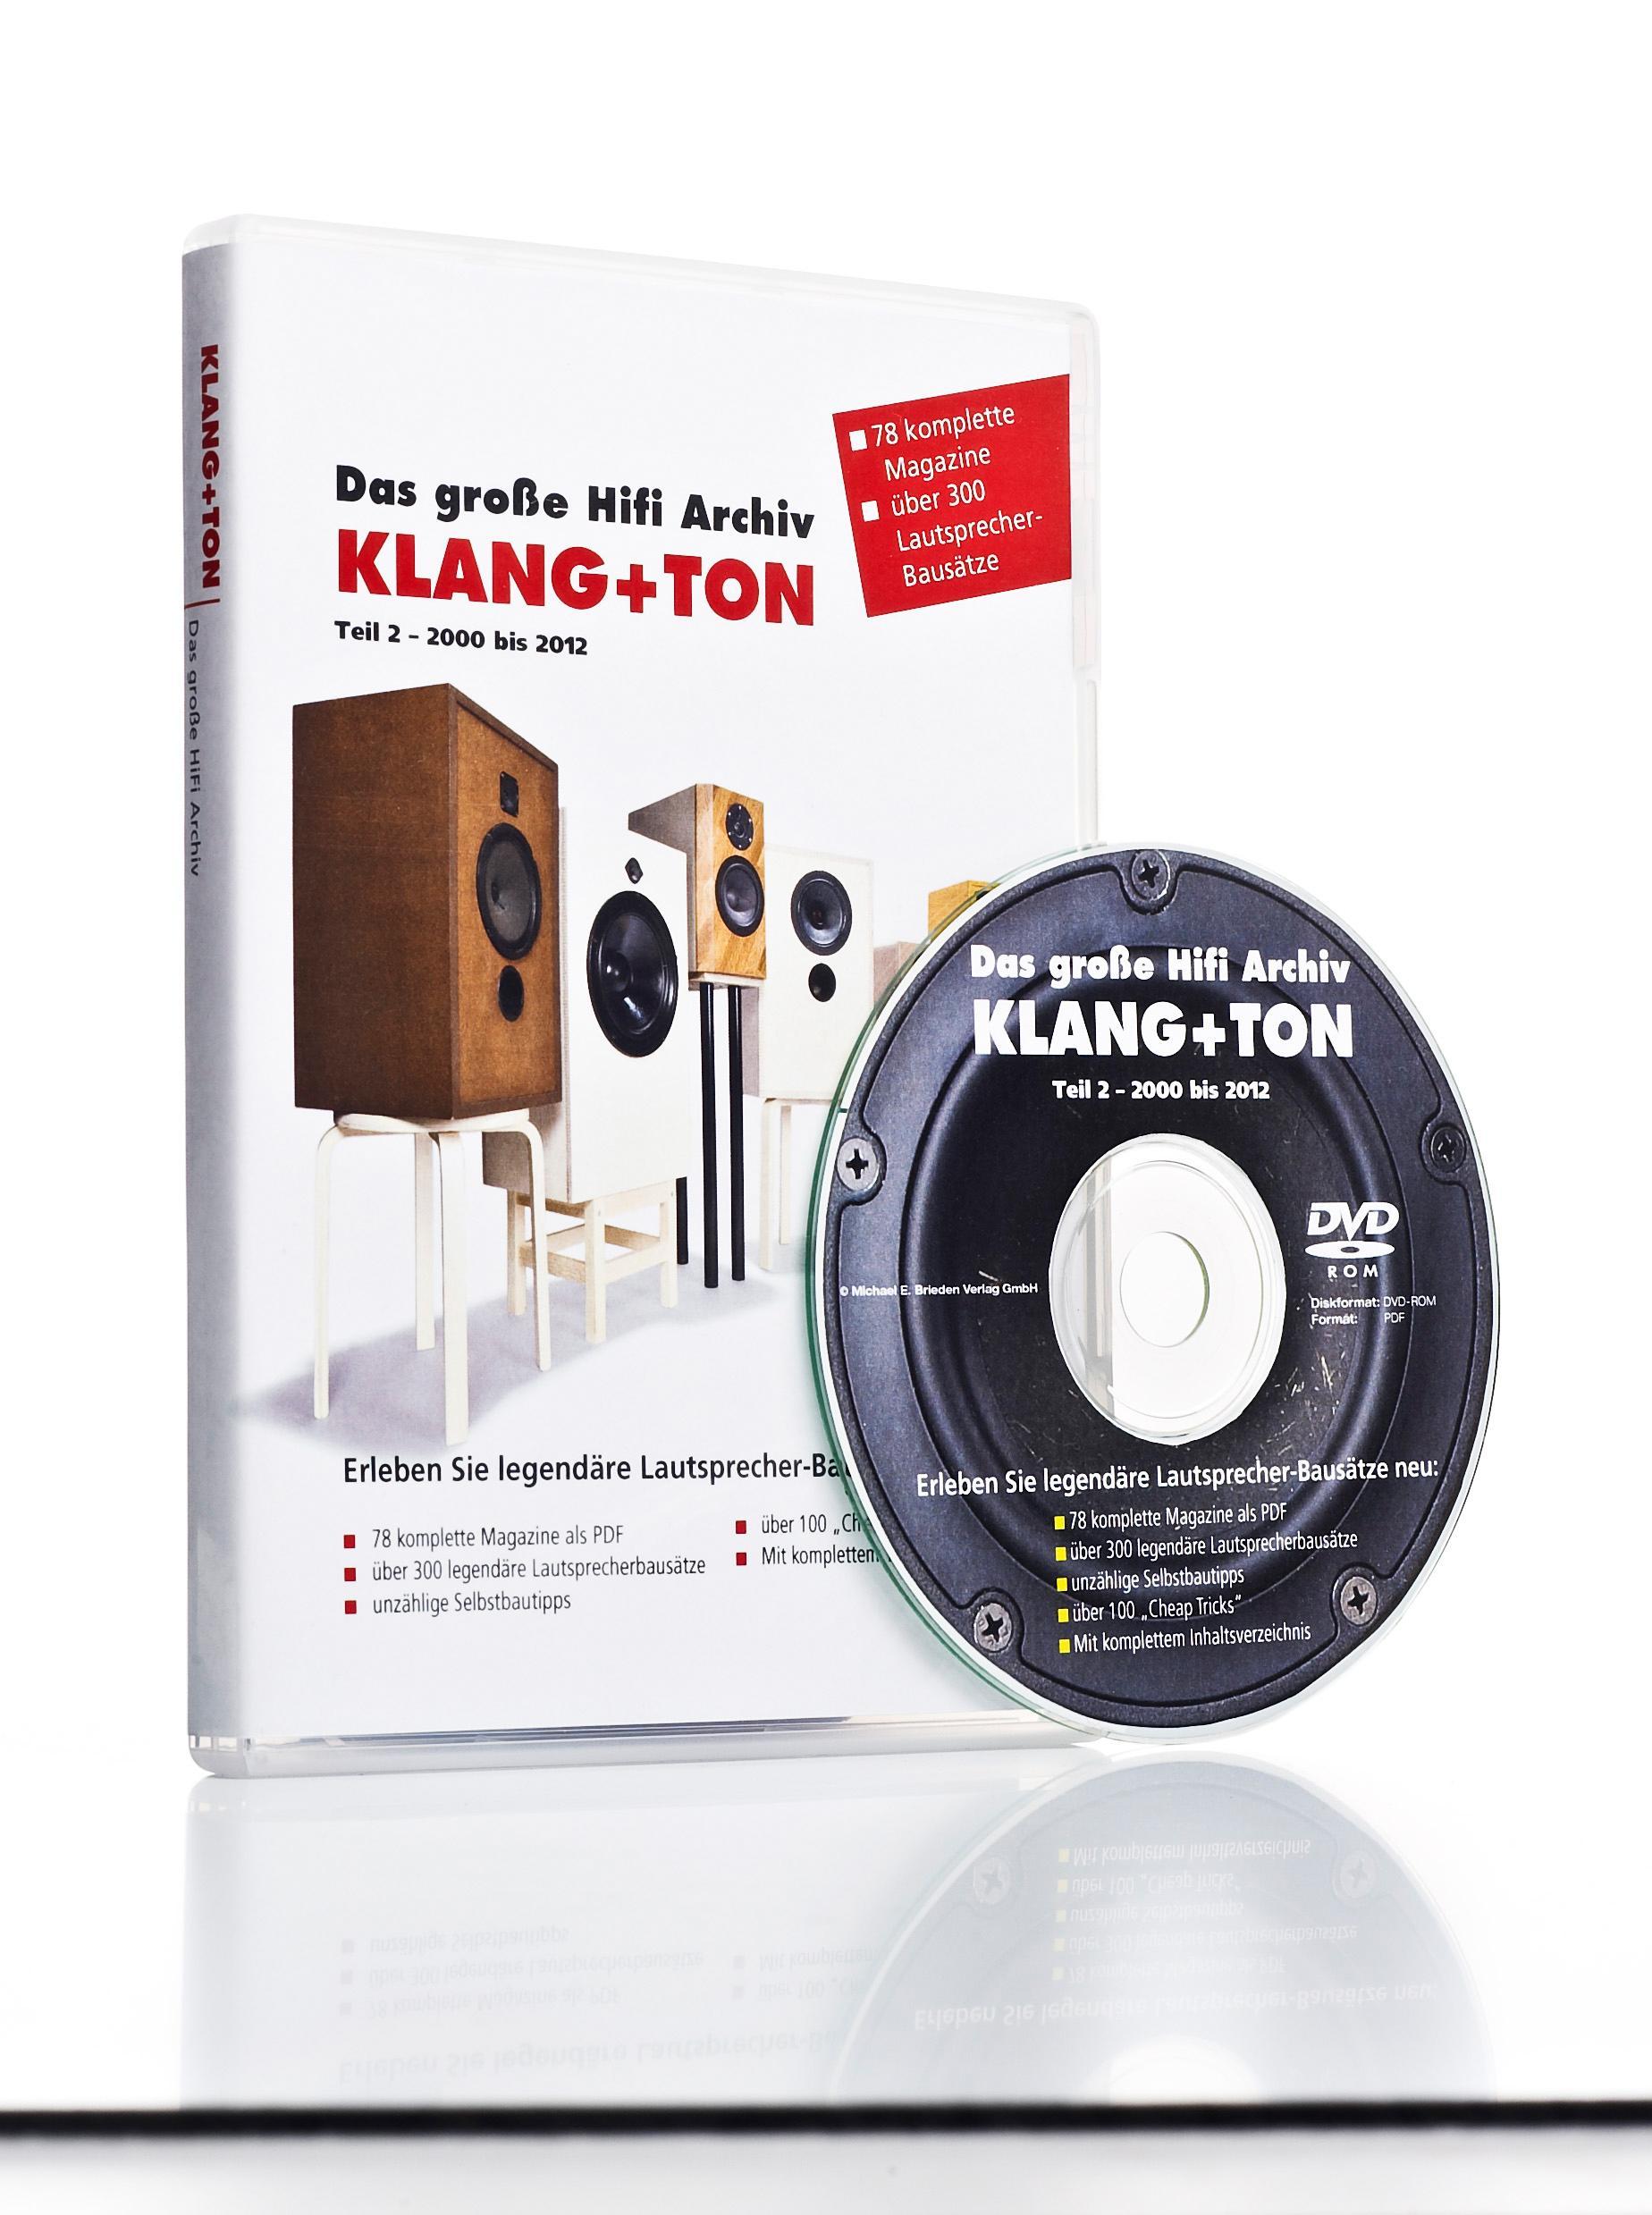 ArK+T_DVD_Archiv2_K+T-Archiv2